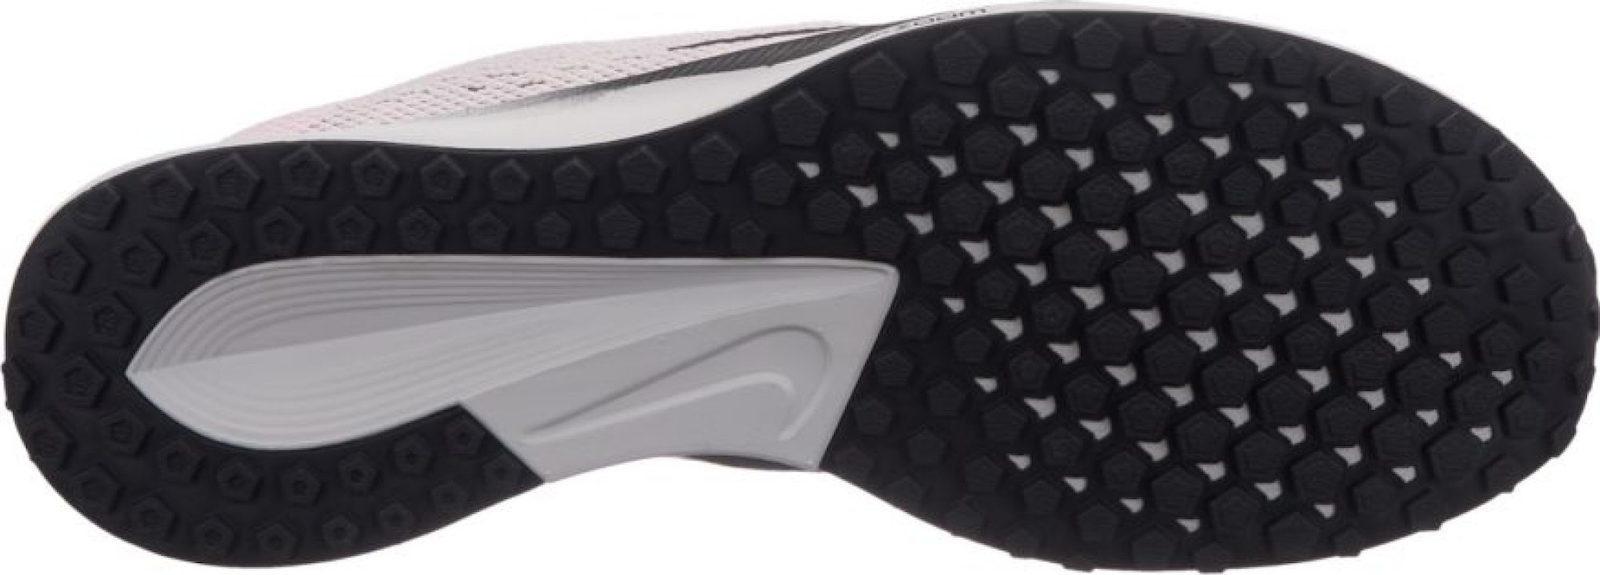 official photos dacde 9fbb7 Nike Air Zoom Elite 10